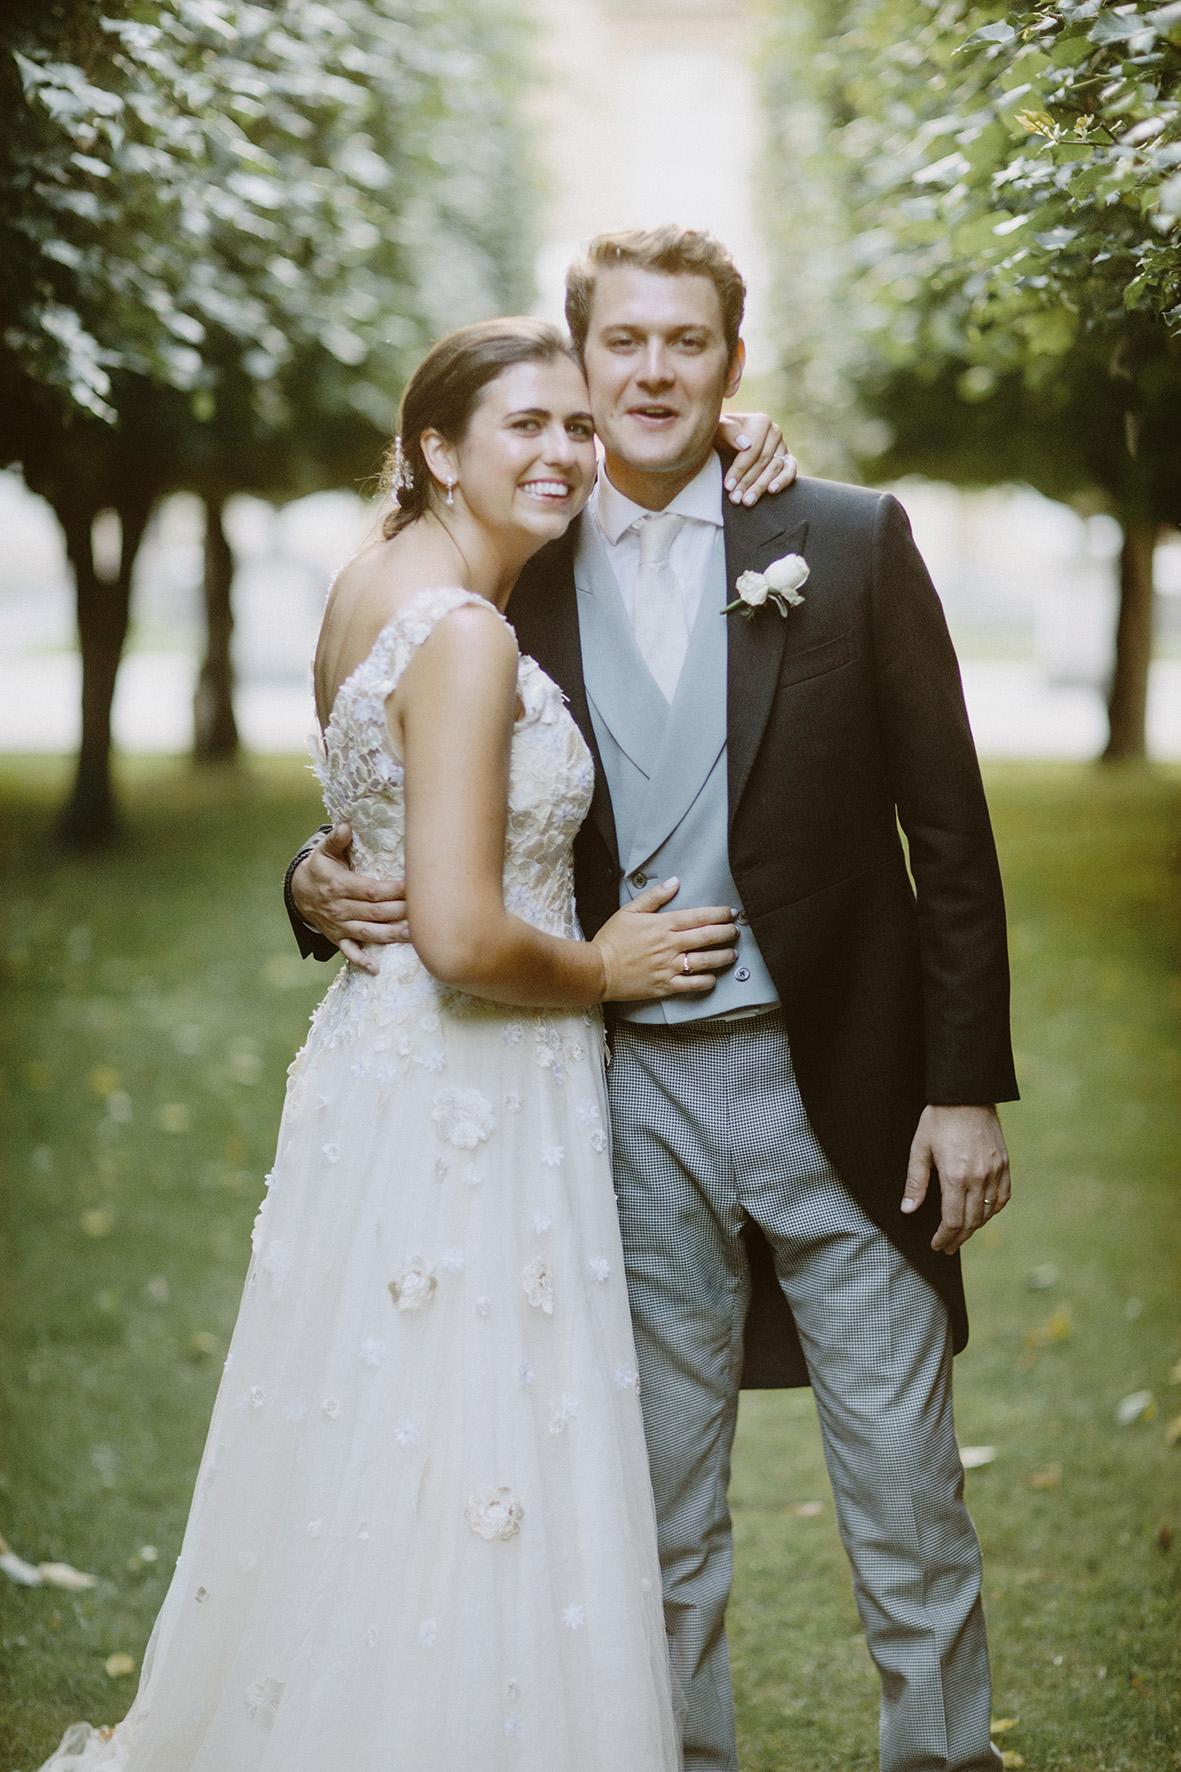 House of lords wedding001.jpg